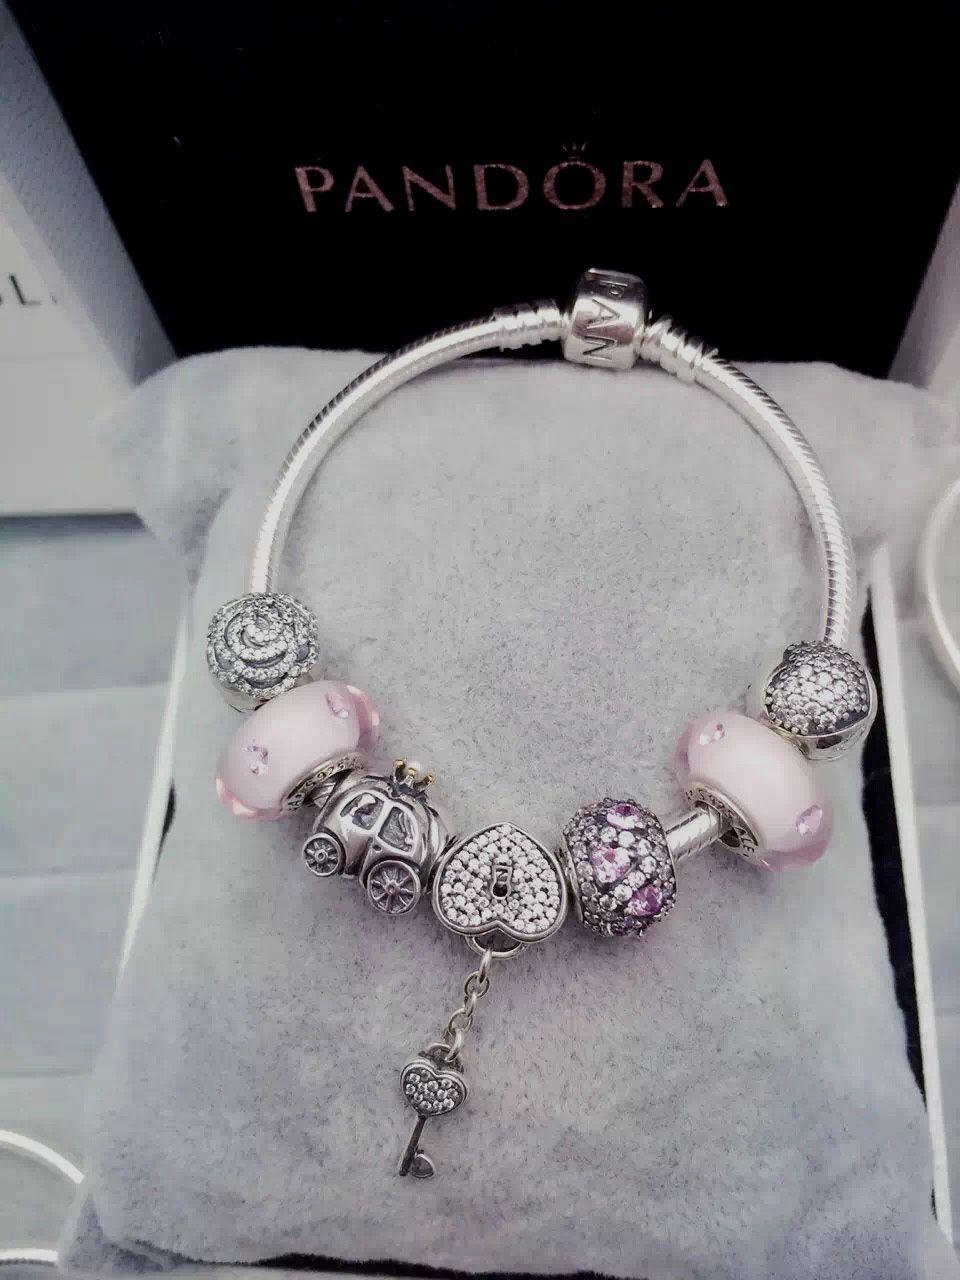 d1d547c1cb572 pandora jewelry for sale #pandorajewelry   Pandora bracelets in 2019 ...